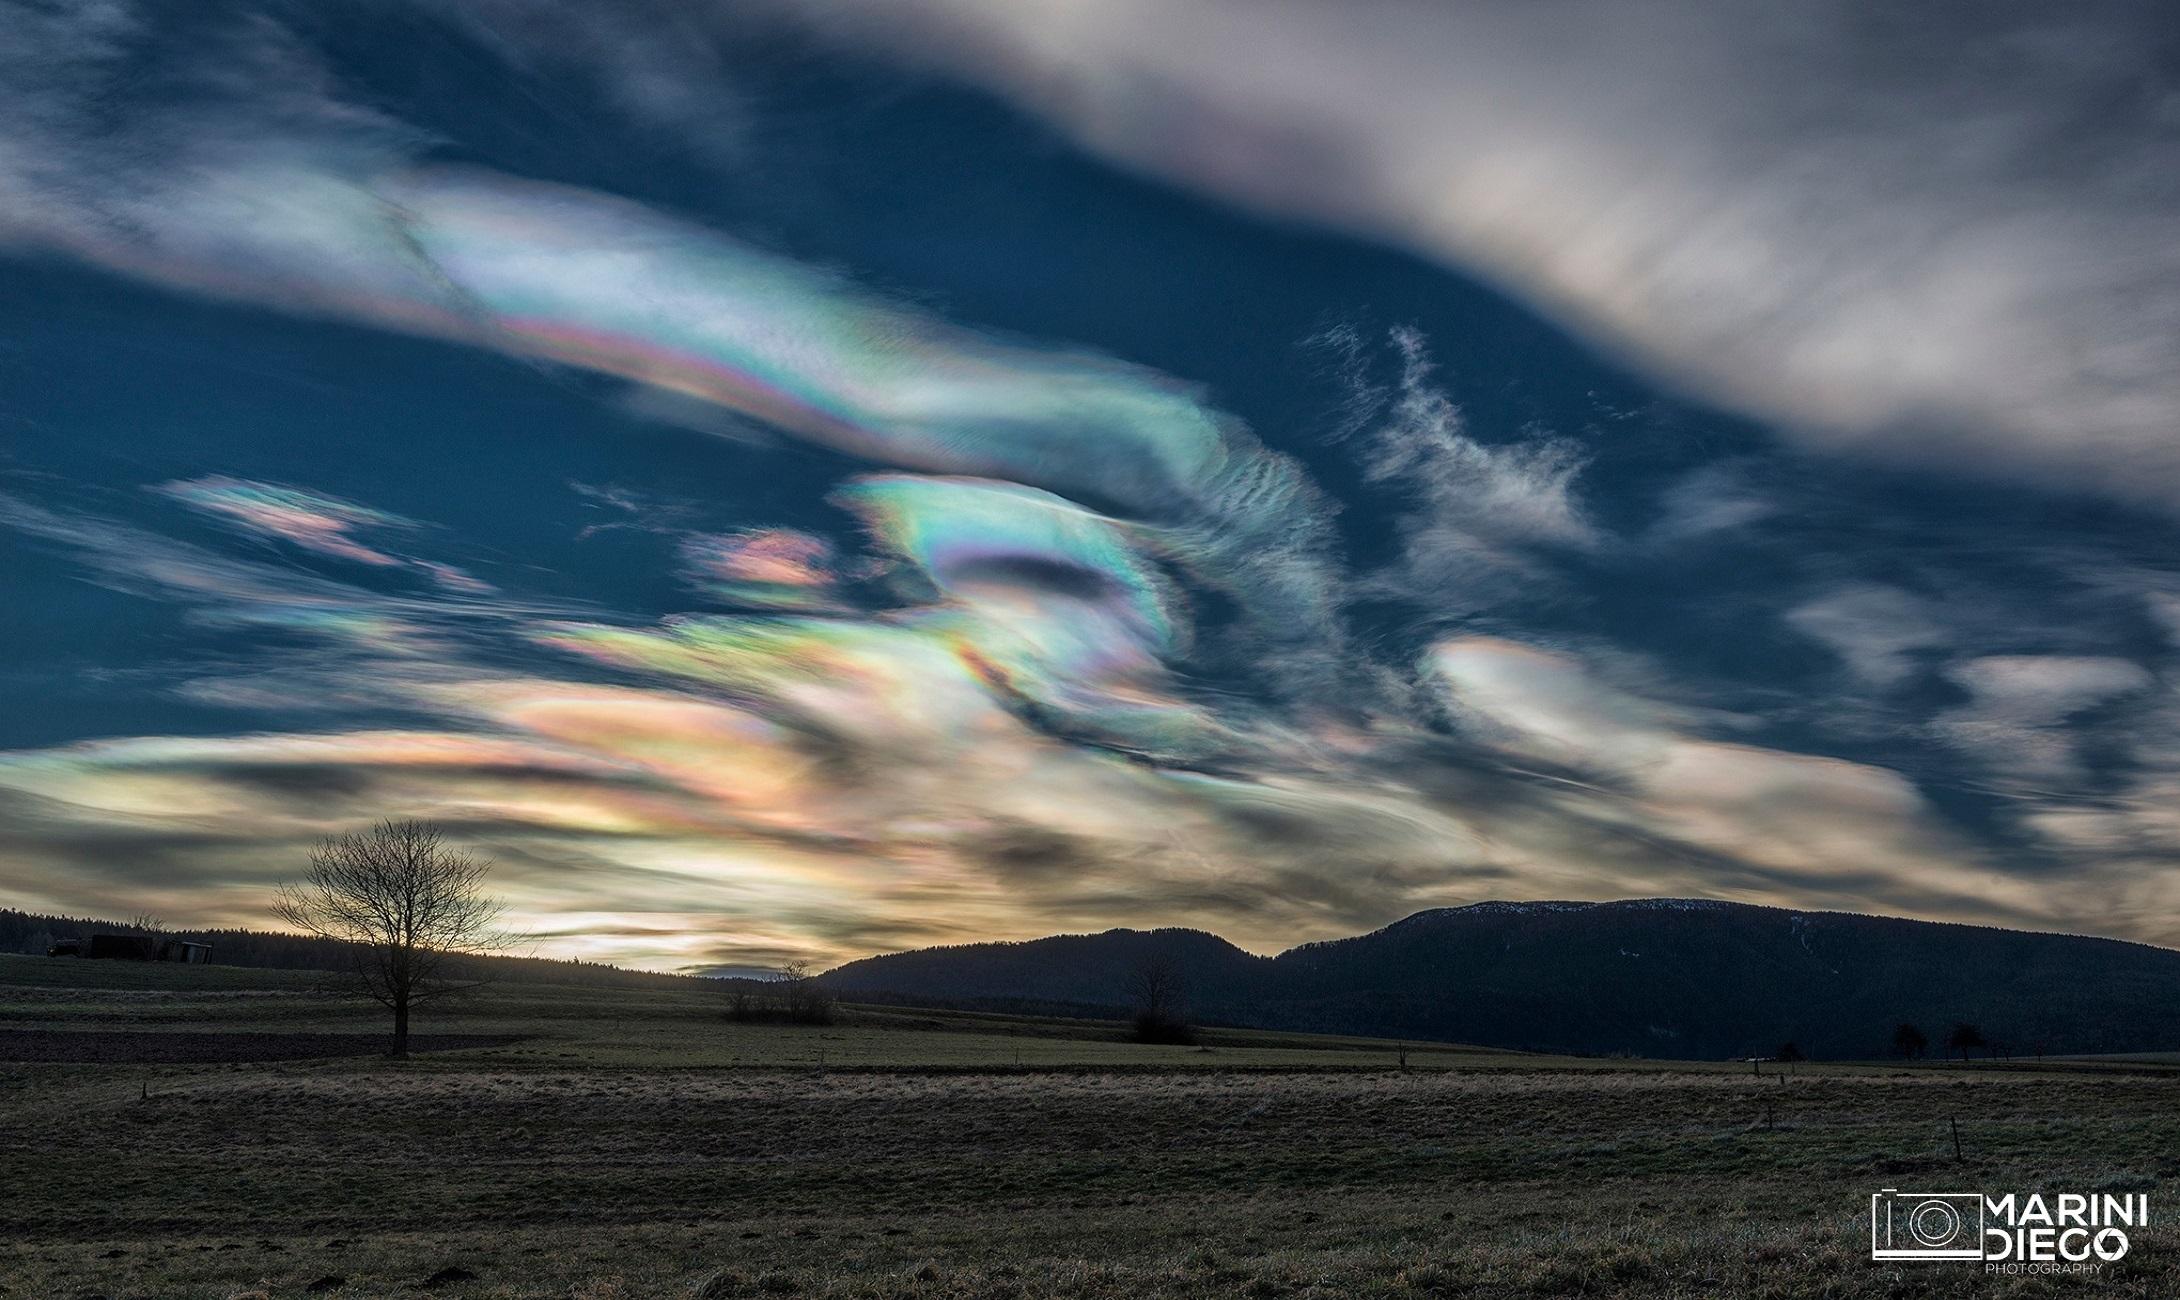 Nuvole arcobaleno ai Pradiei di Fondo